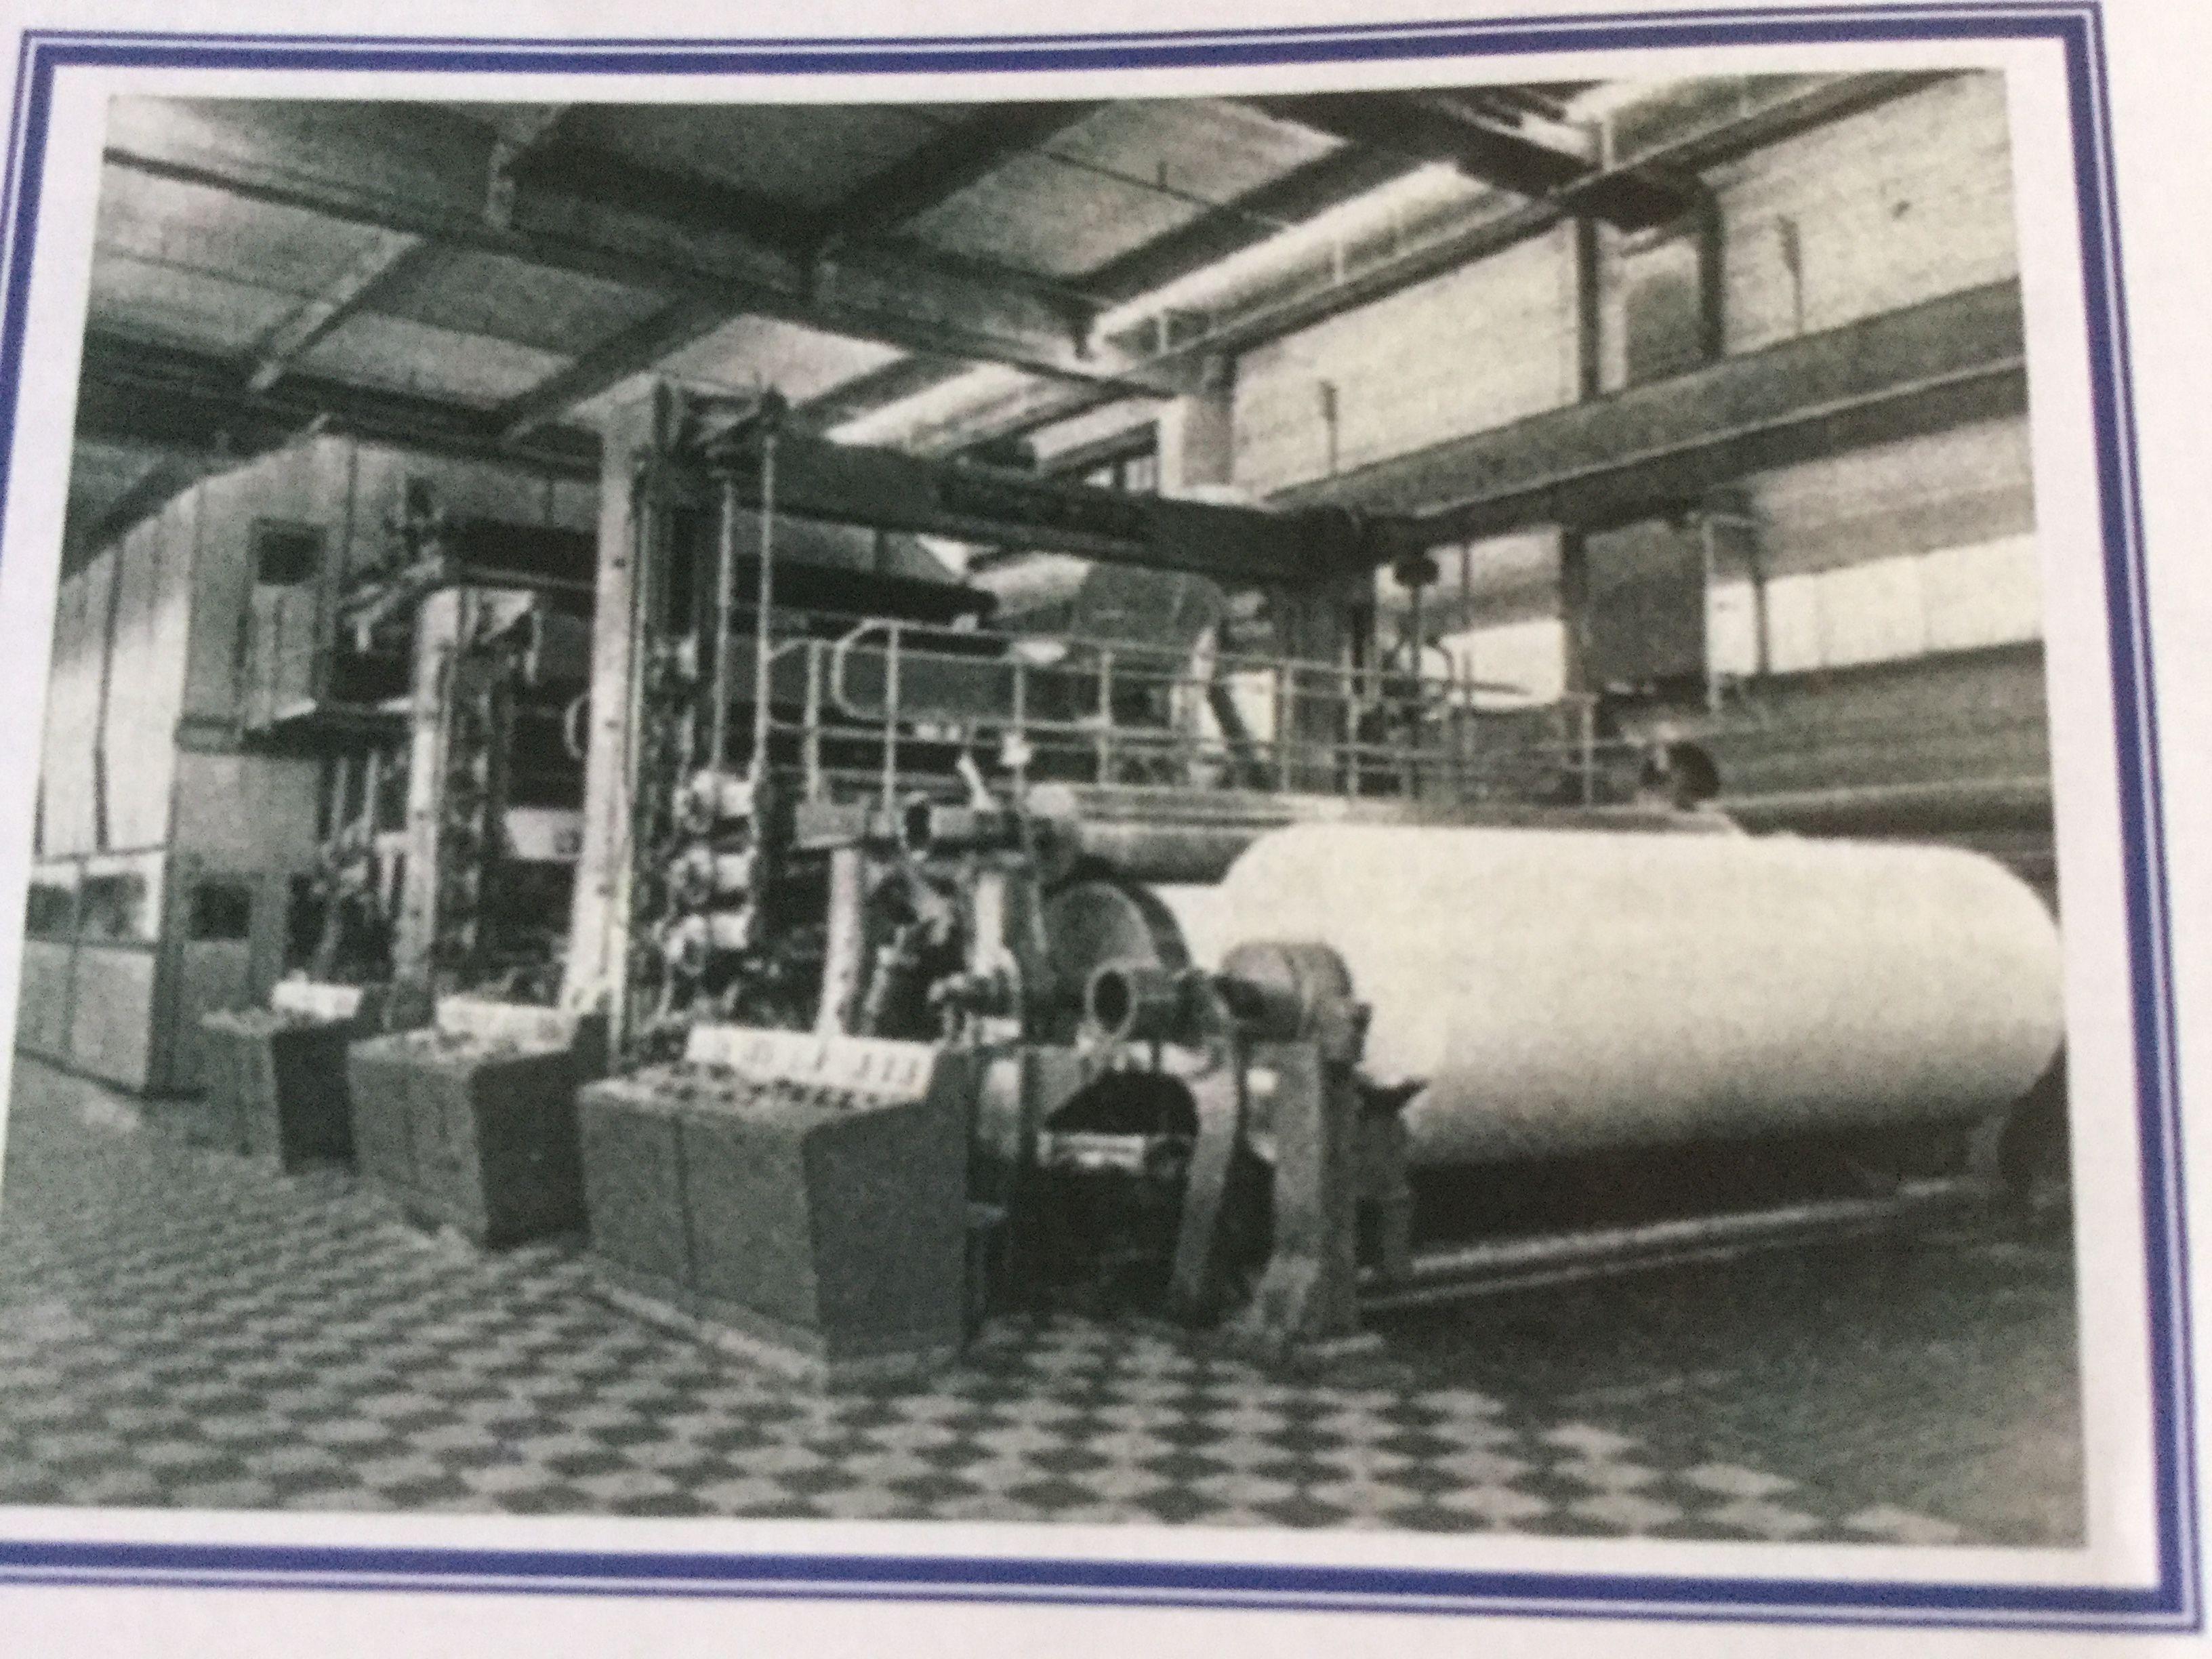 Pm7 Gelderland Tielens papierfabriek Nijmegen